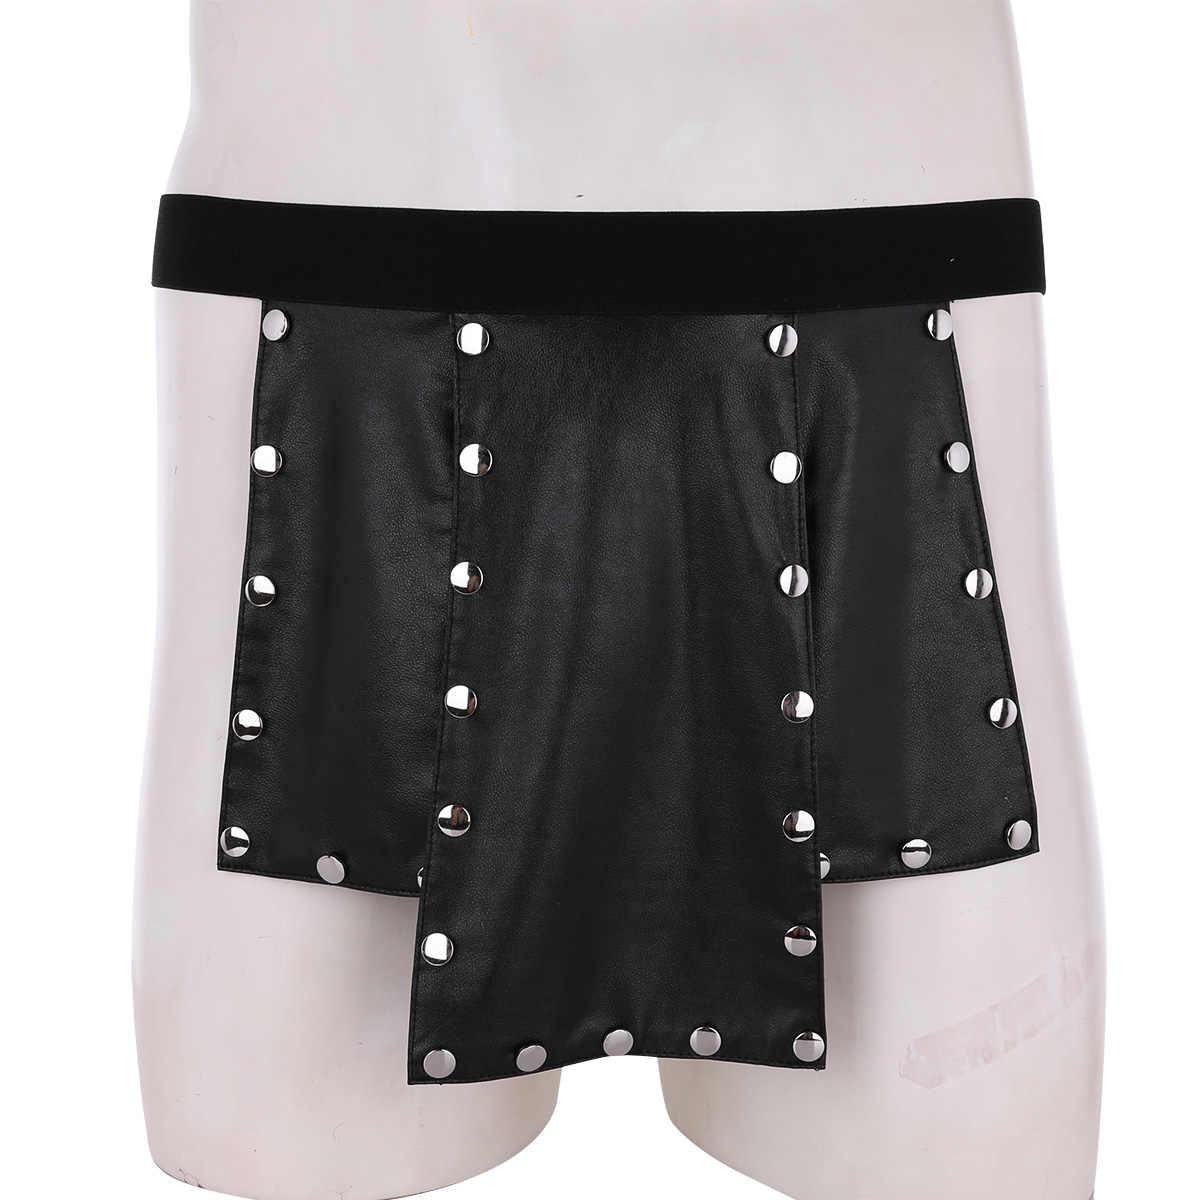 b1823c15e70 iiniim Sexy Mens Lingerie Novelty Scotland Style Gay Panties 6 Panel Faux  Leather Low Rise Metal Studded Kilt Underwear Skirt